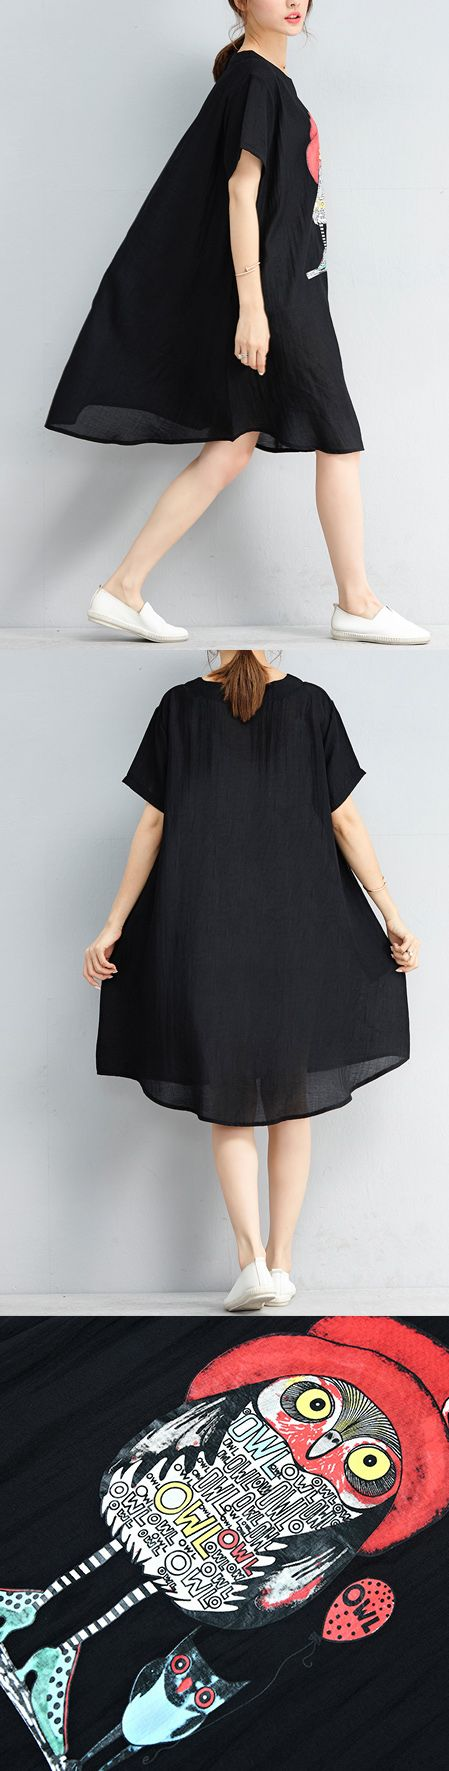 dae6716320 2018 black chiffon shift dresses oversize shirt dress casual short sleeve  Cartoon print dress5